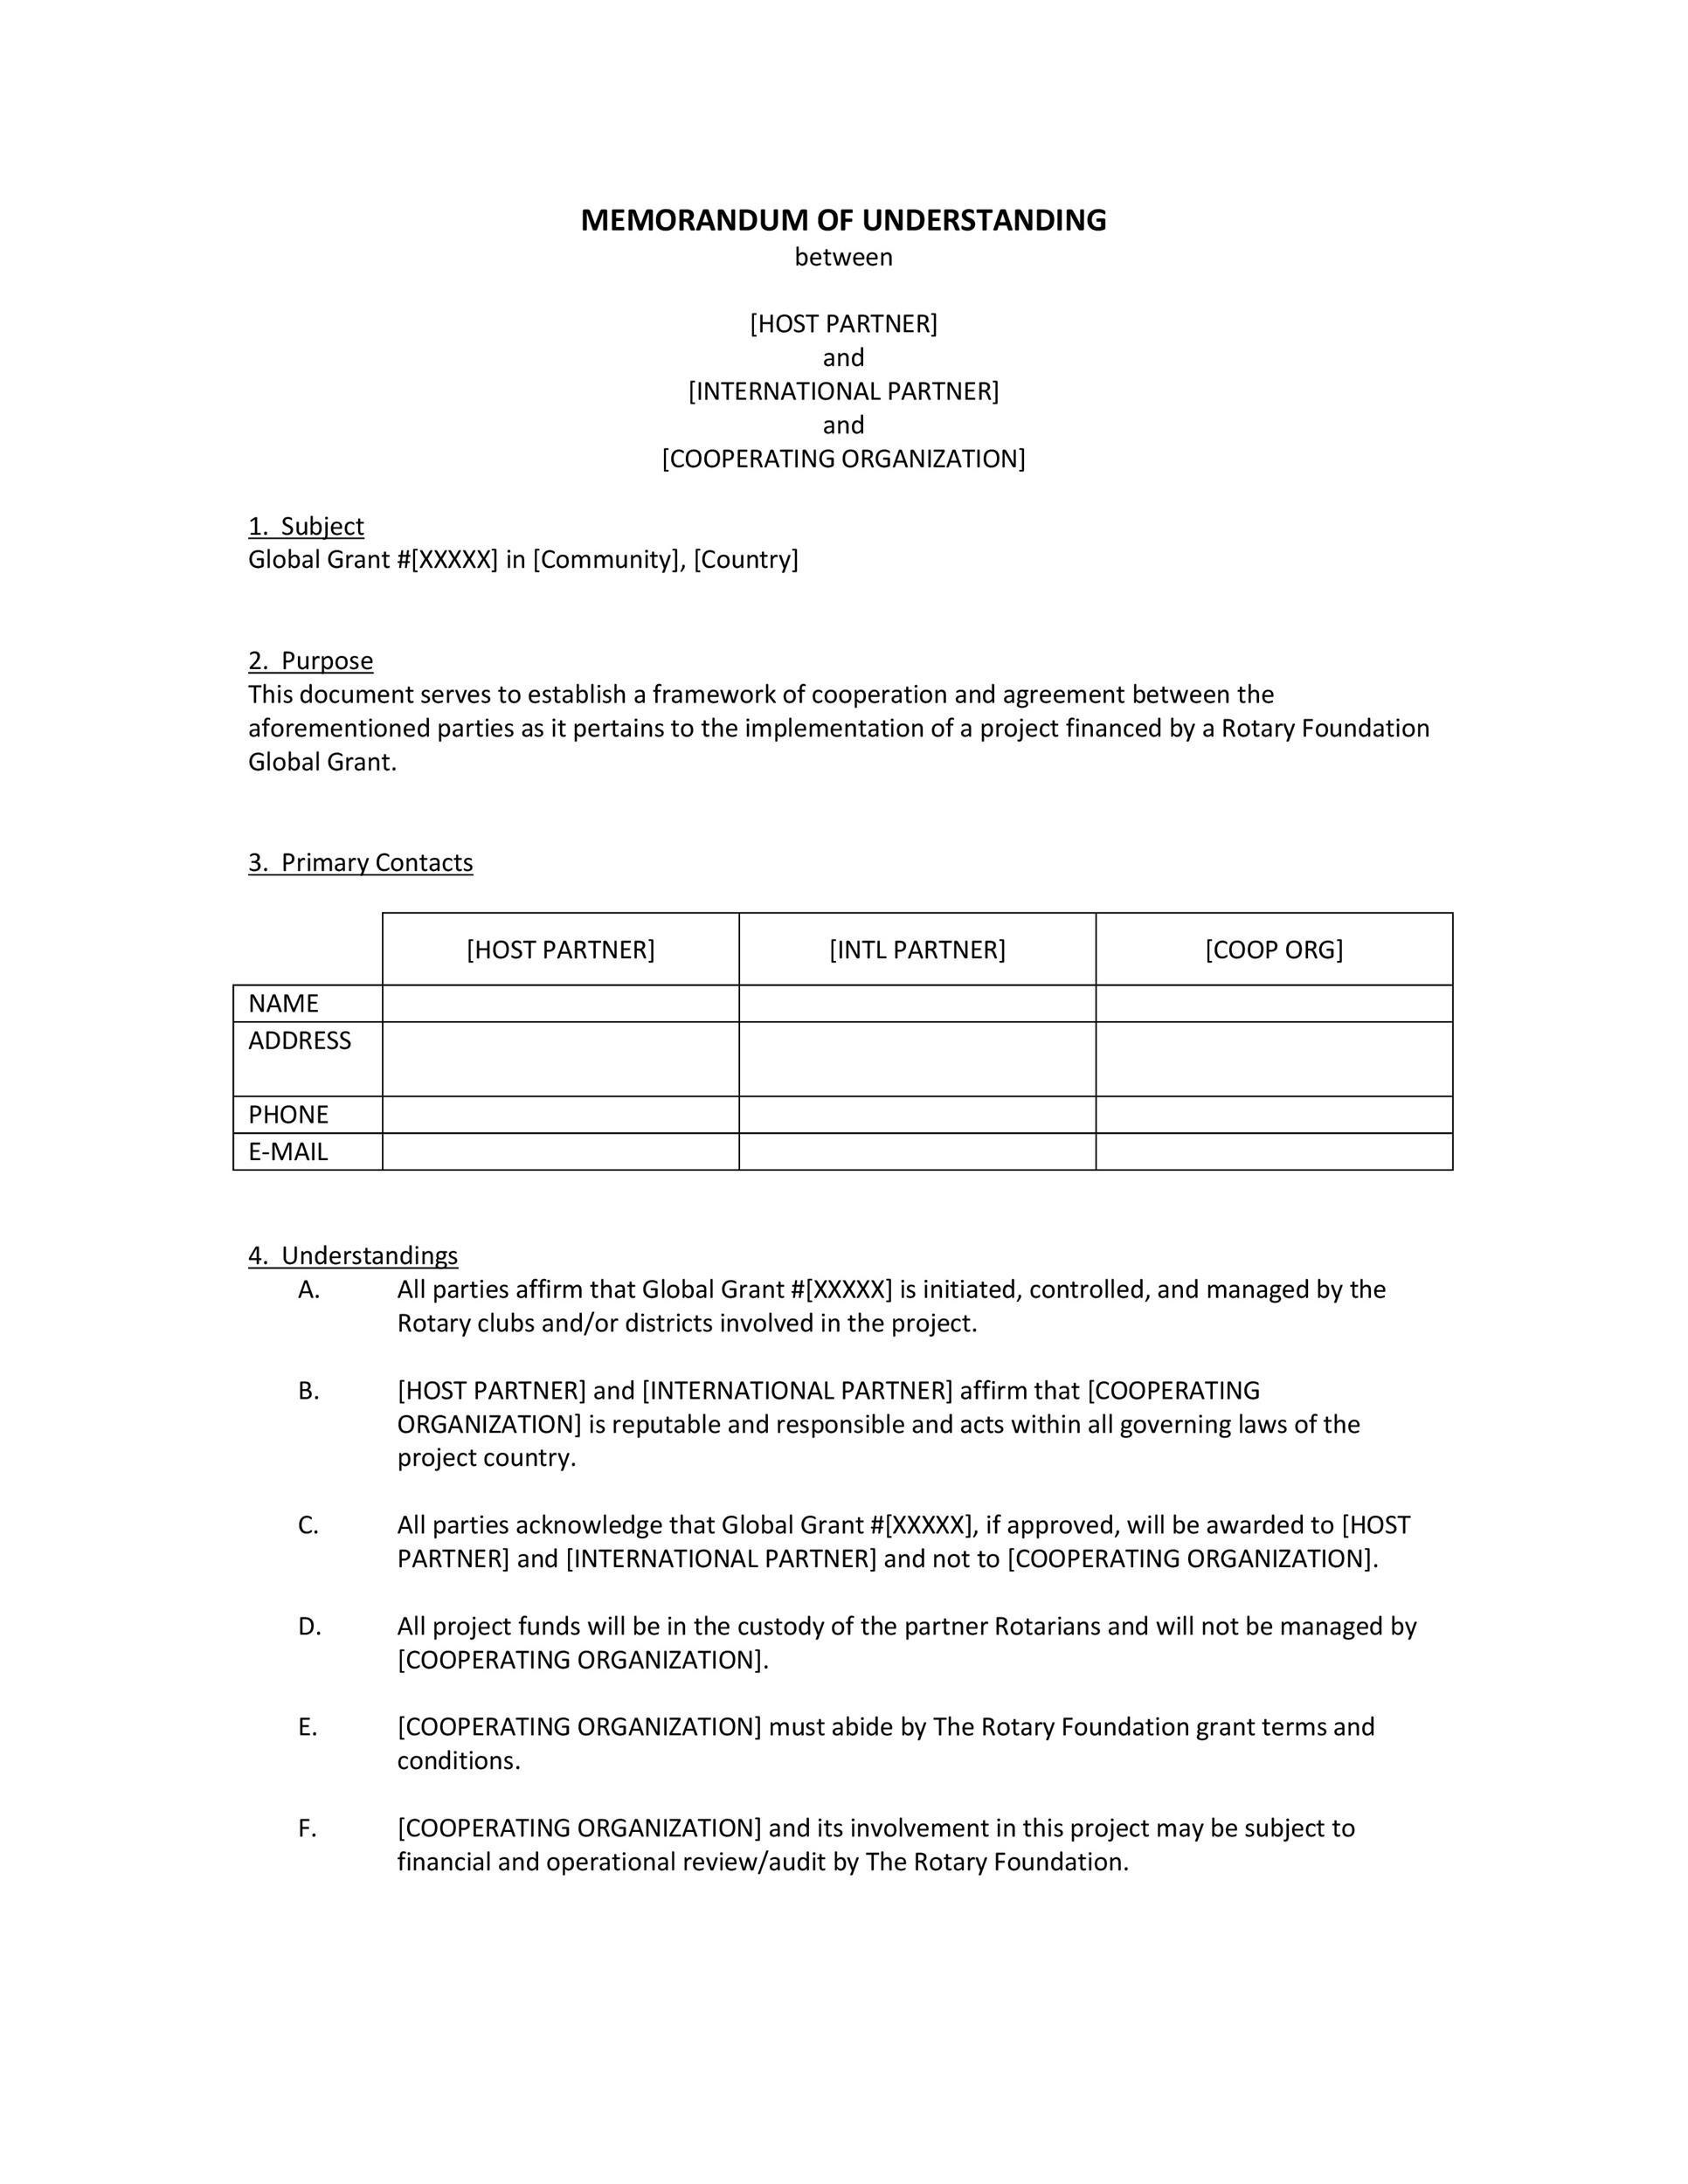 Free Memorandum of Understanding Template 26